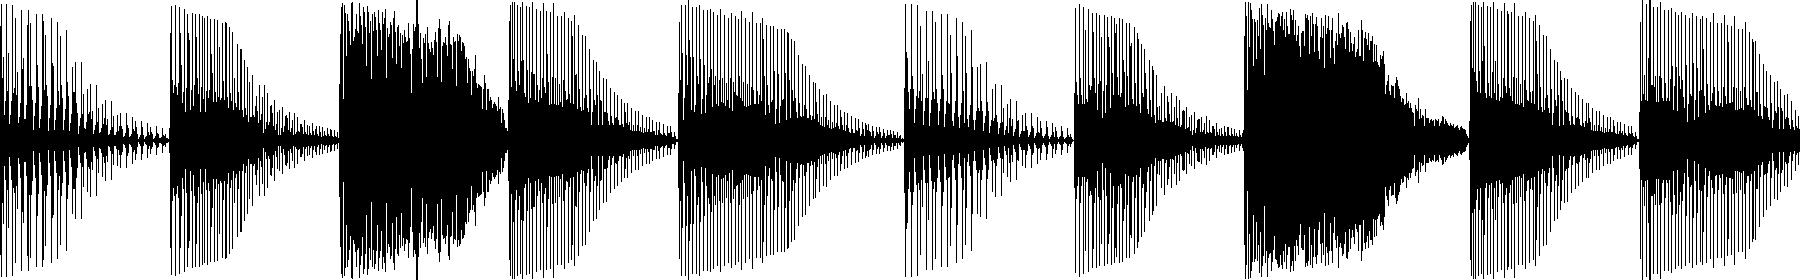 ehp synloop 130 syncpiece c